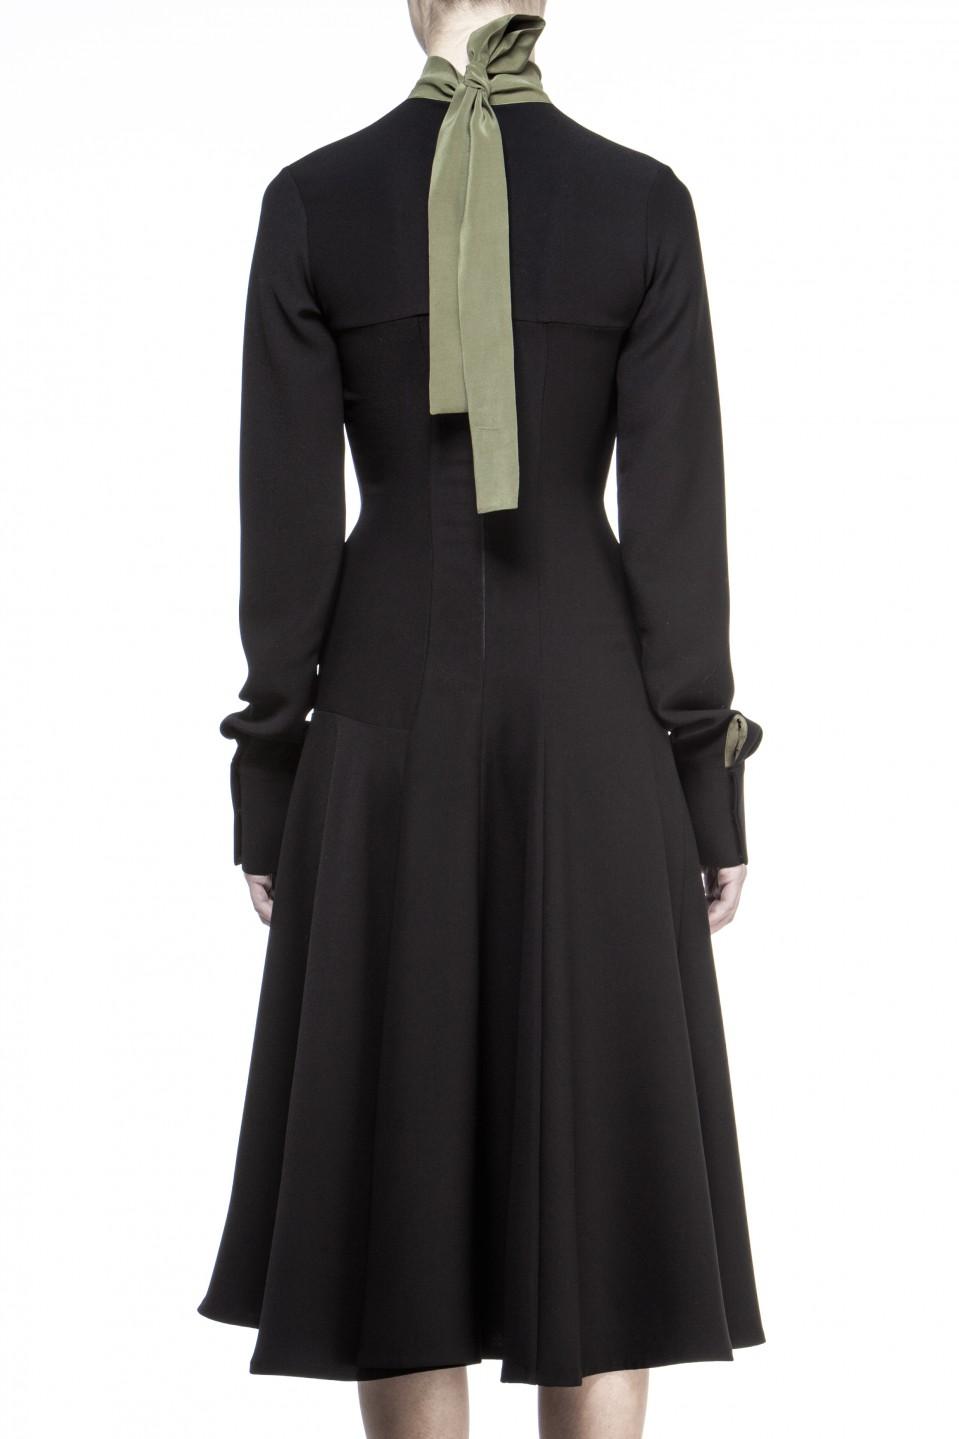 Atelier Kikala Dress 3